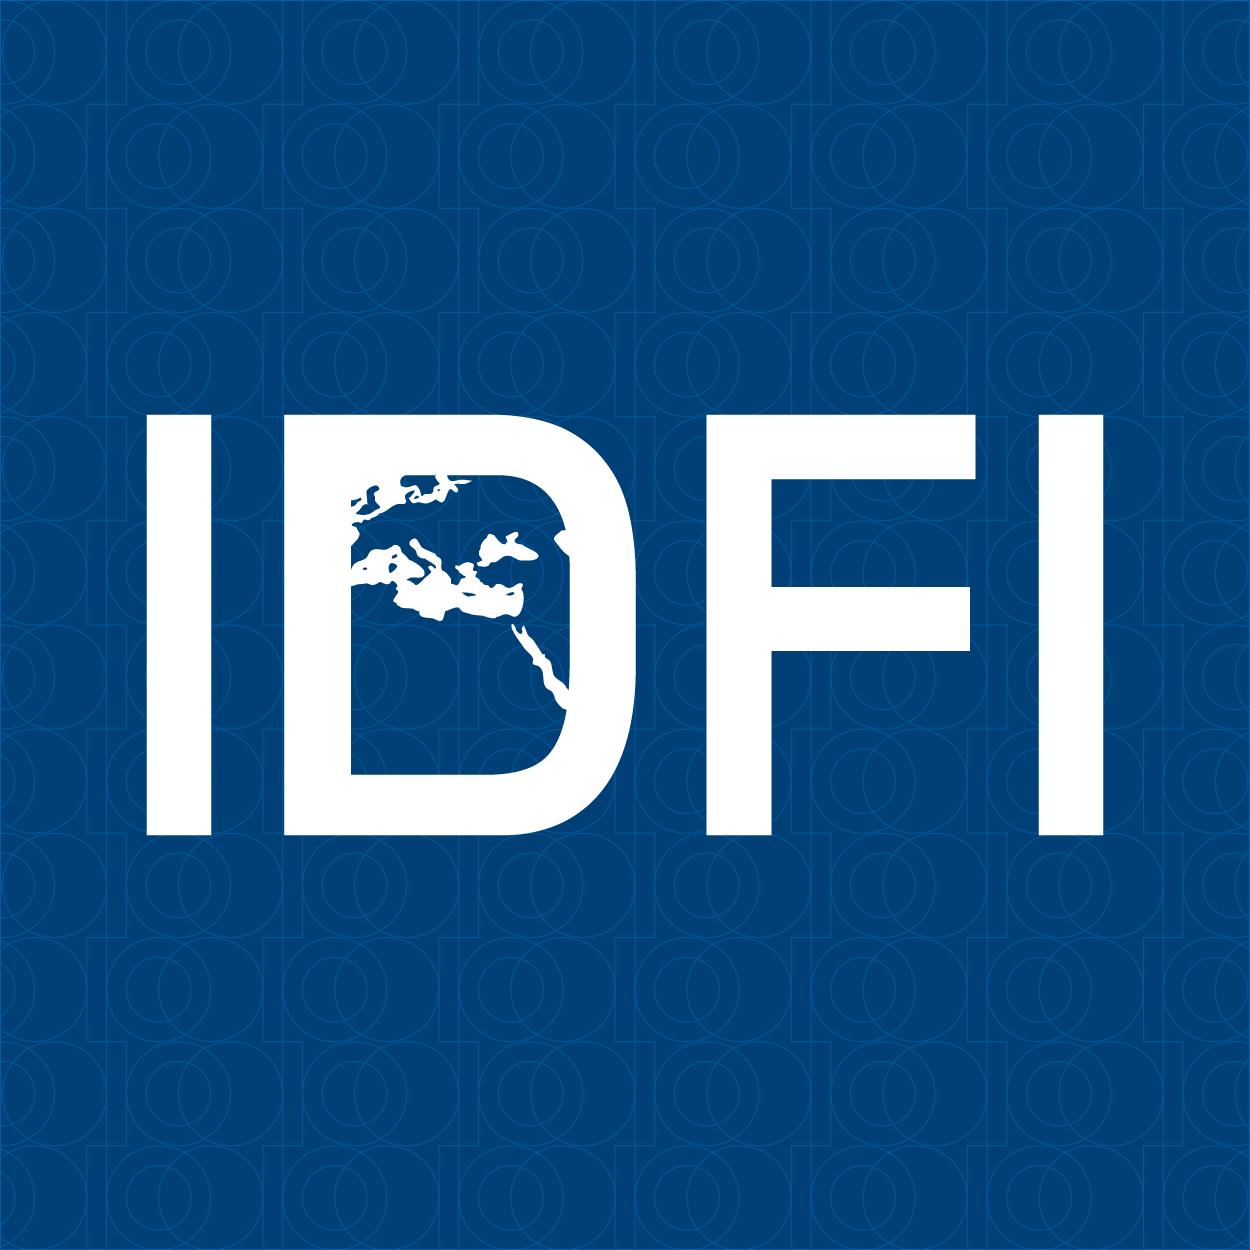 IDFI პრემიერ-მინისტრს მიმართავს